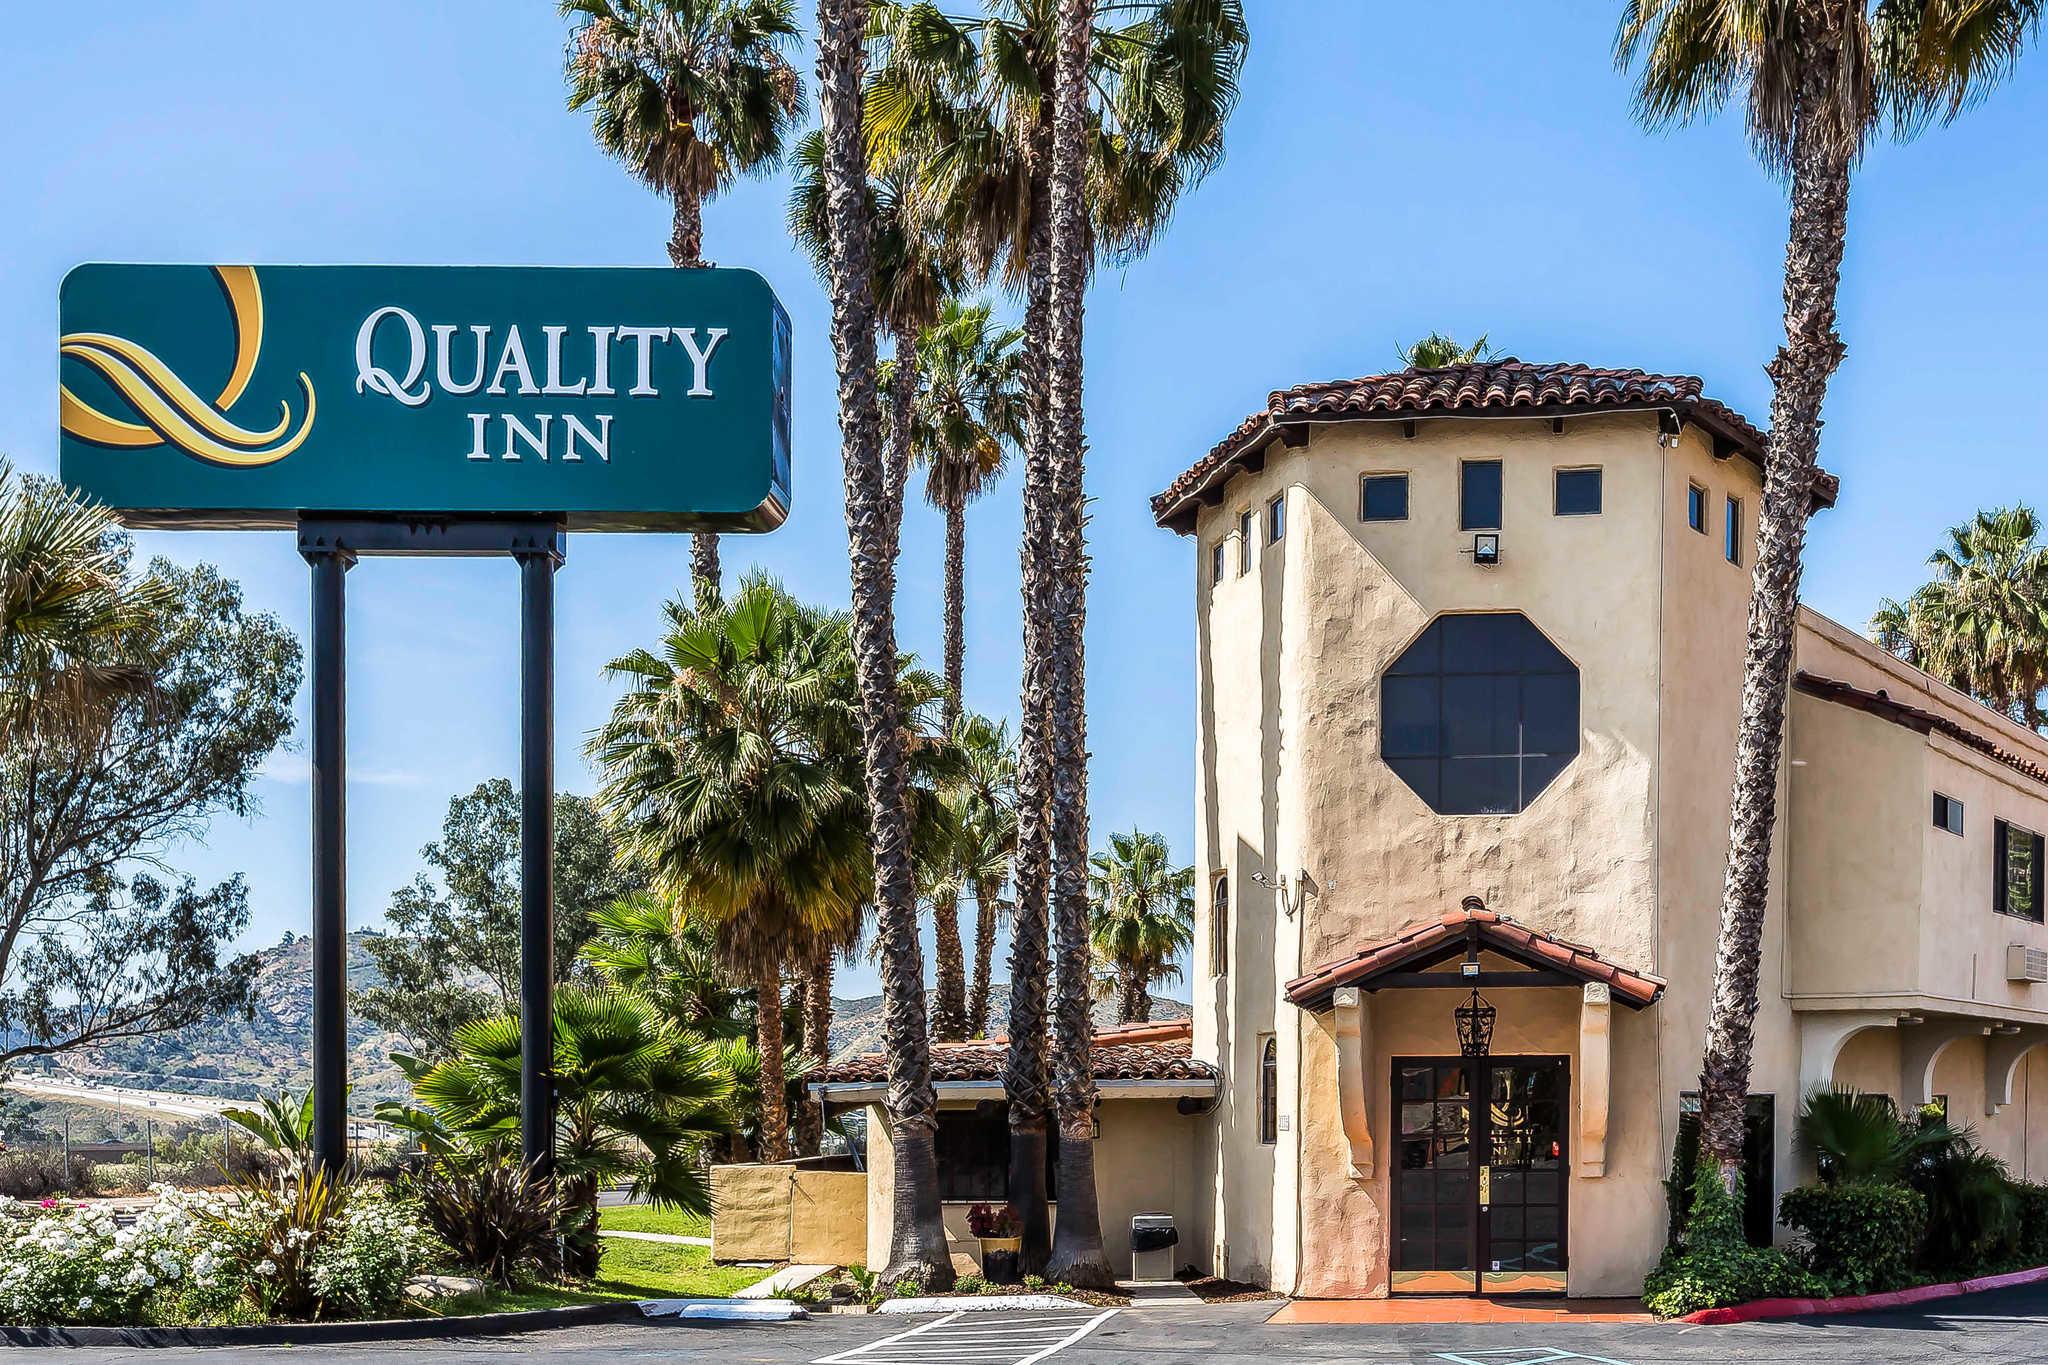 Quality Inn Fallbrook I-15 image 1